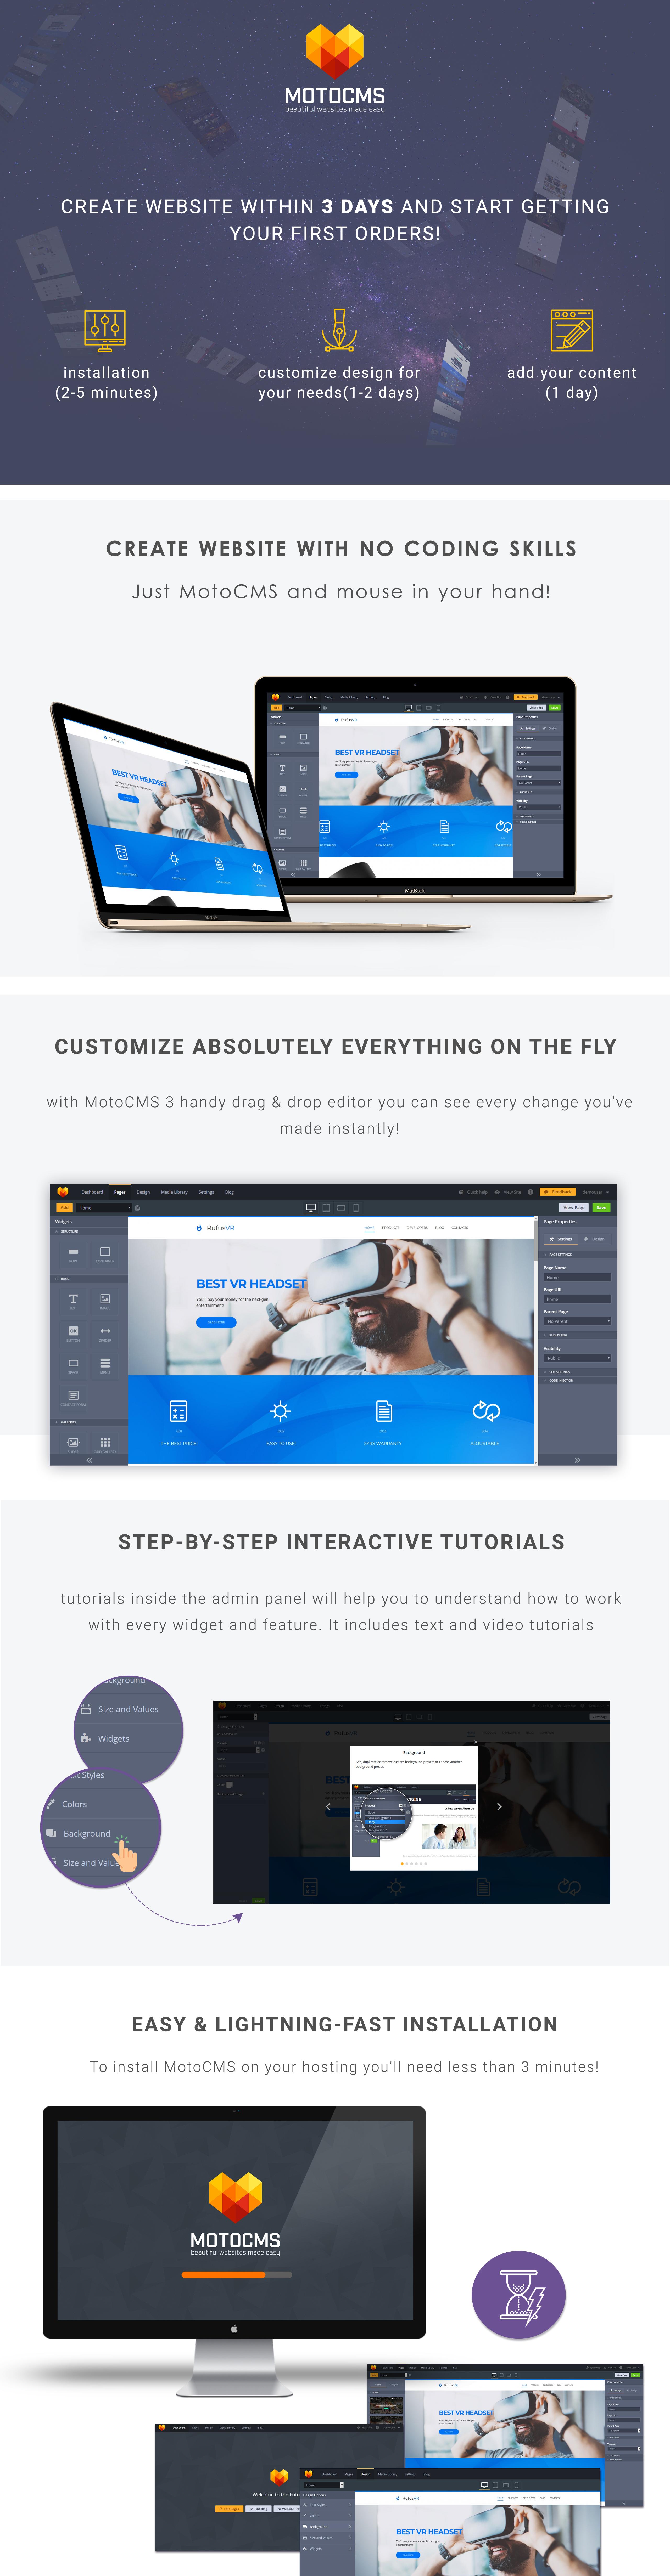 RufusVR - VR Startup Moto CMS 3 Template